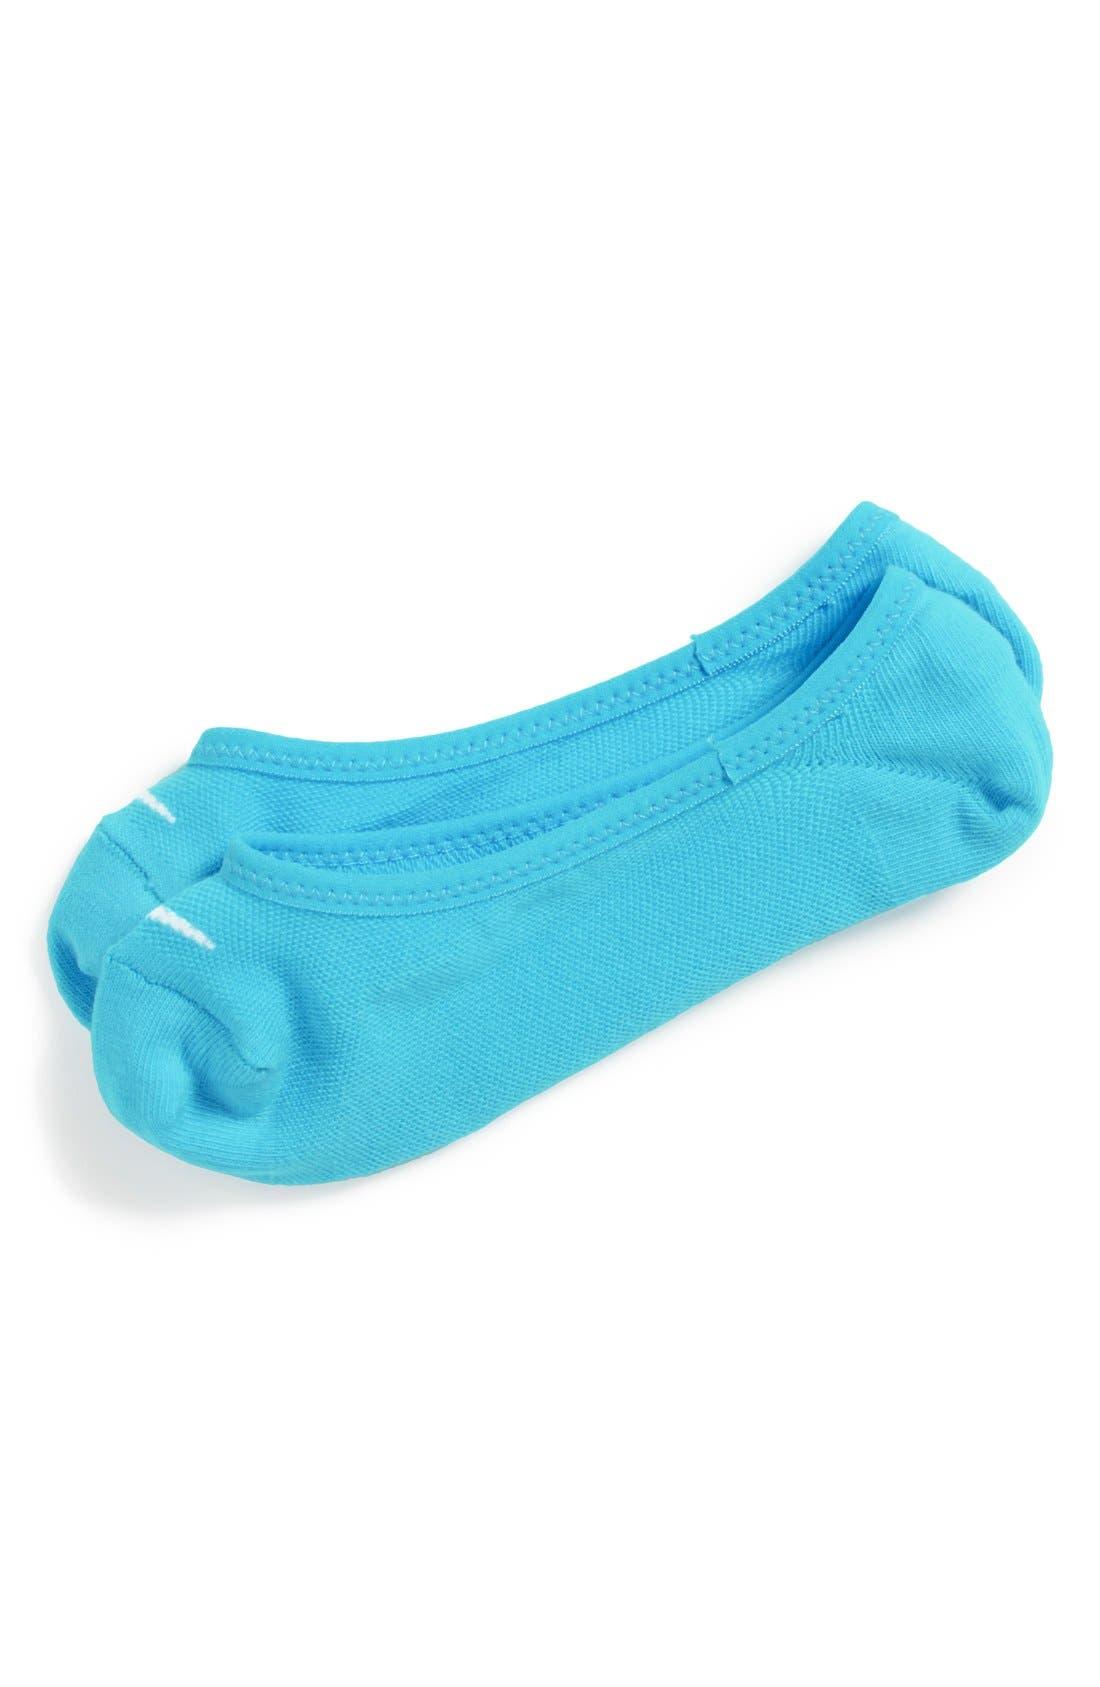 Main Image - Nike 'Studio' No-Show Socks (Women)